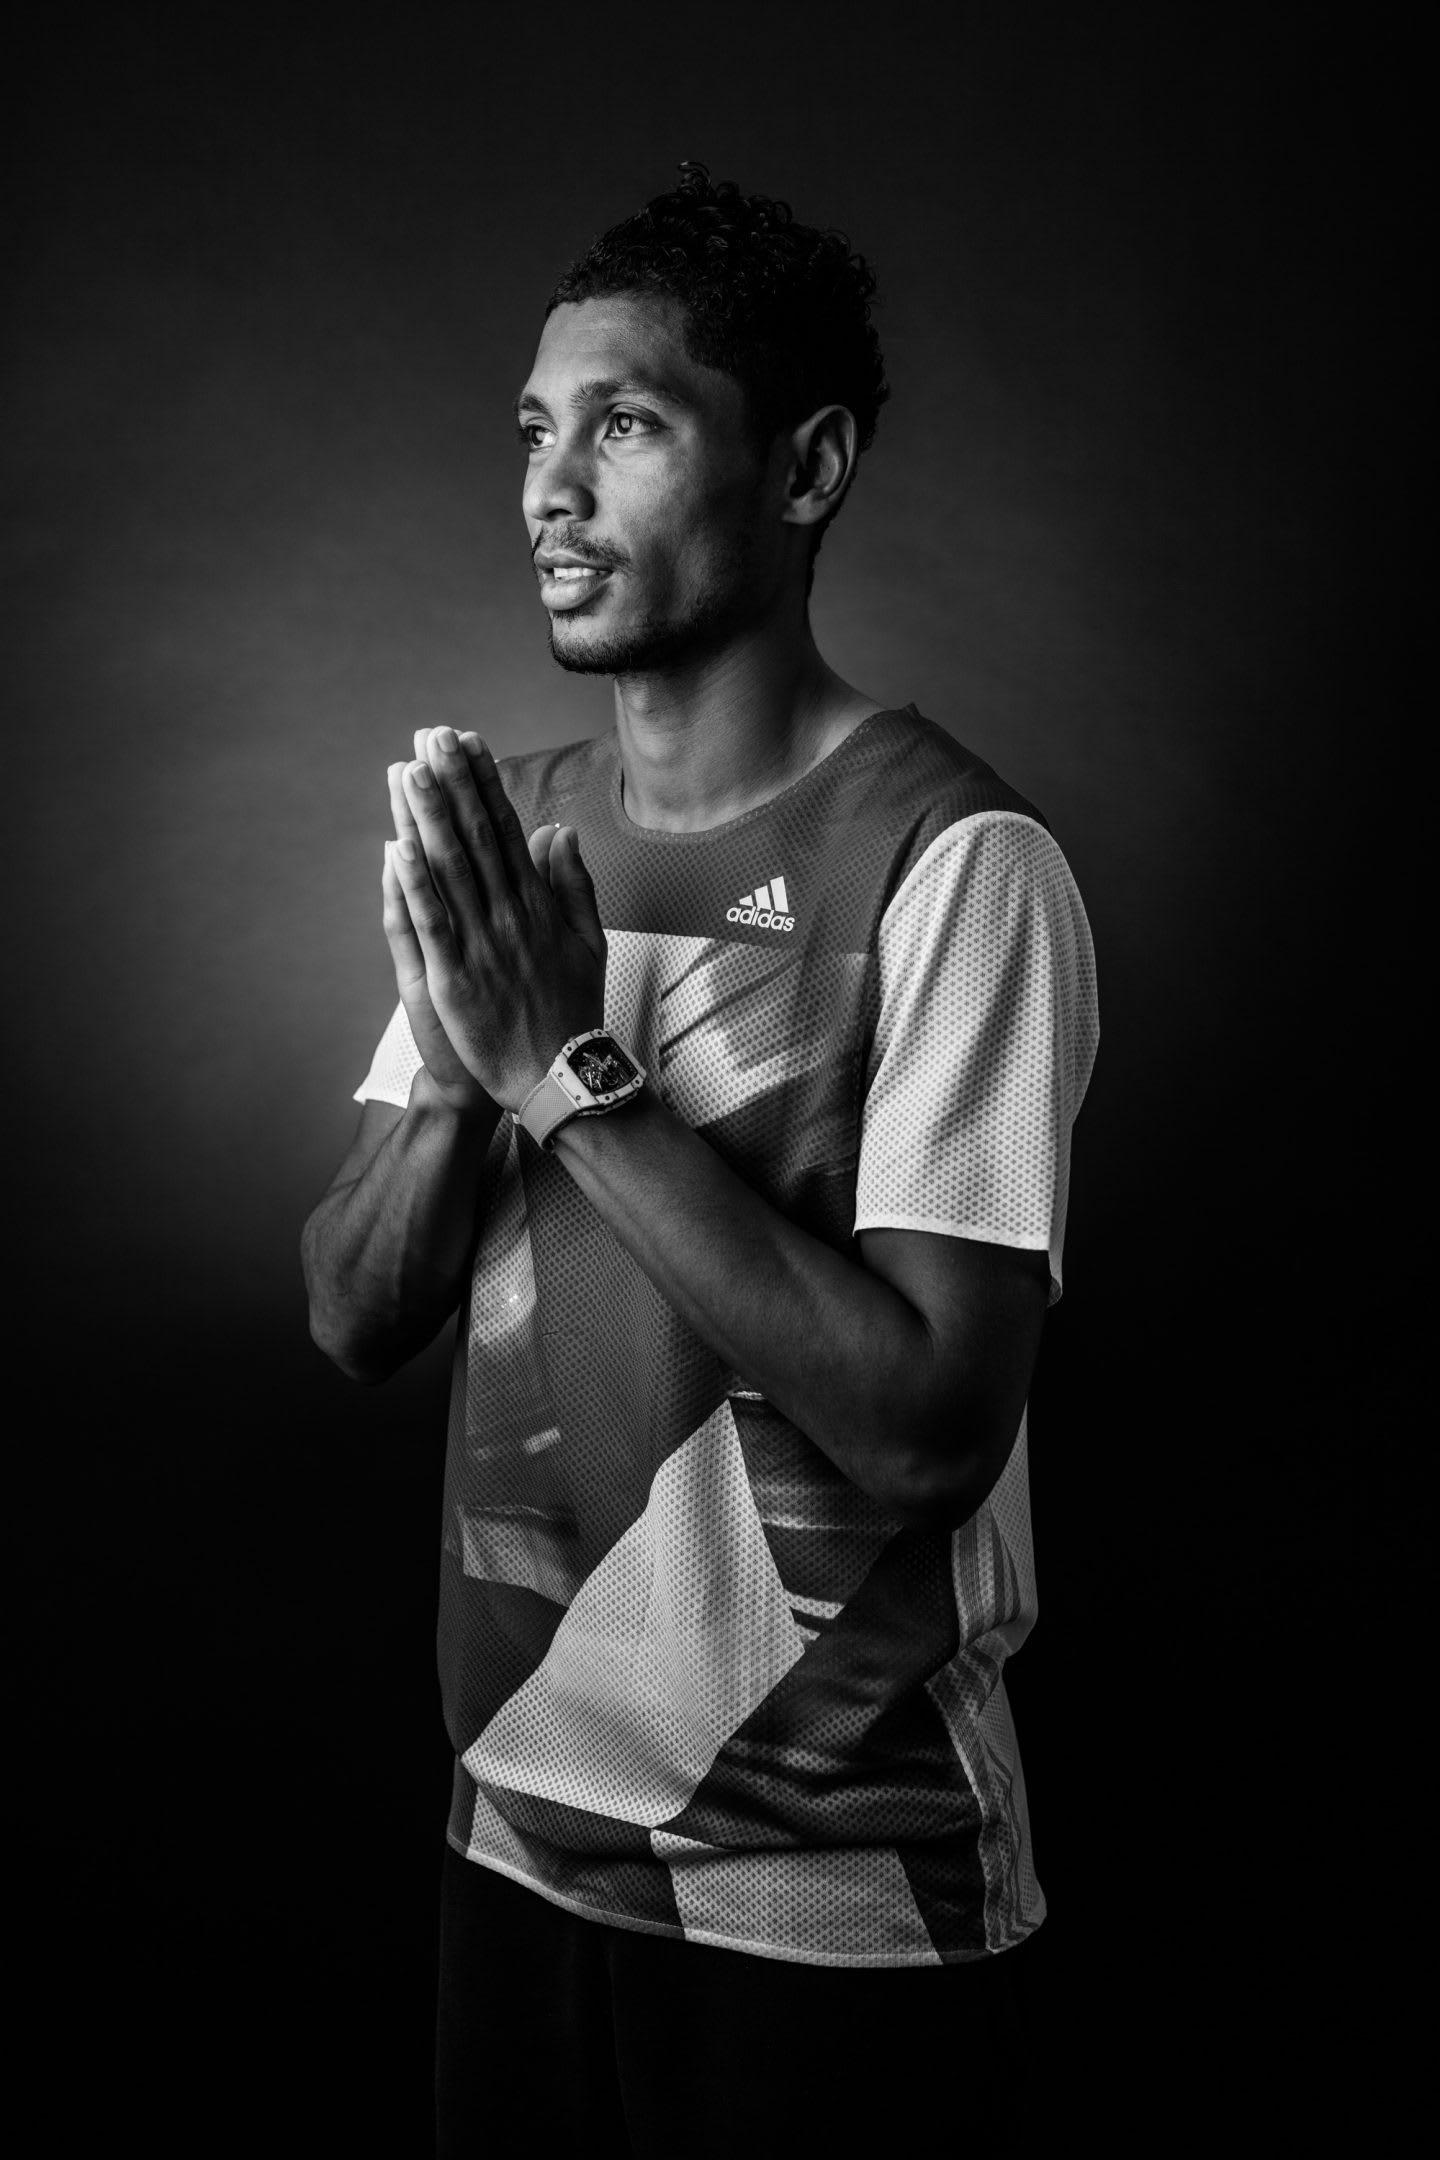 Wayde van Niekerk, 400m Olympic champion 2016, world record holder